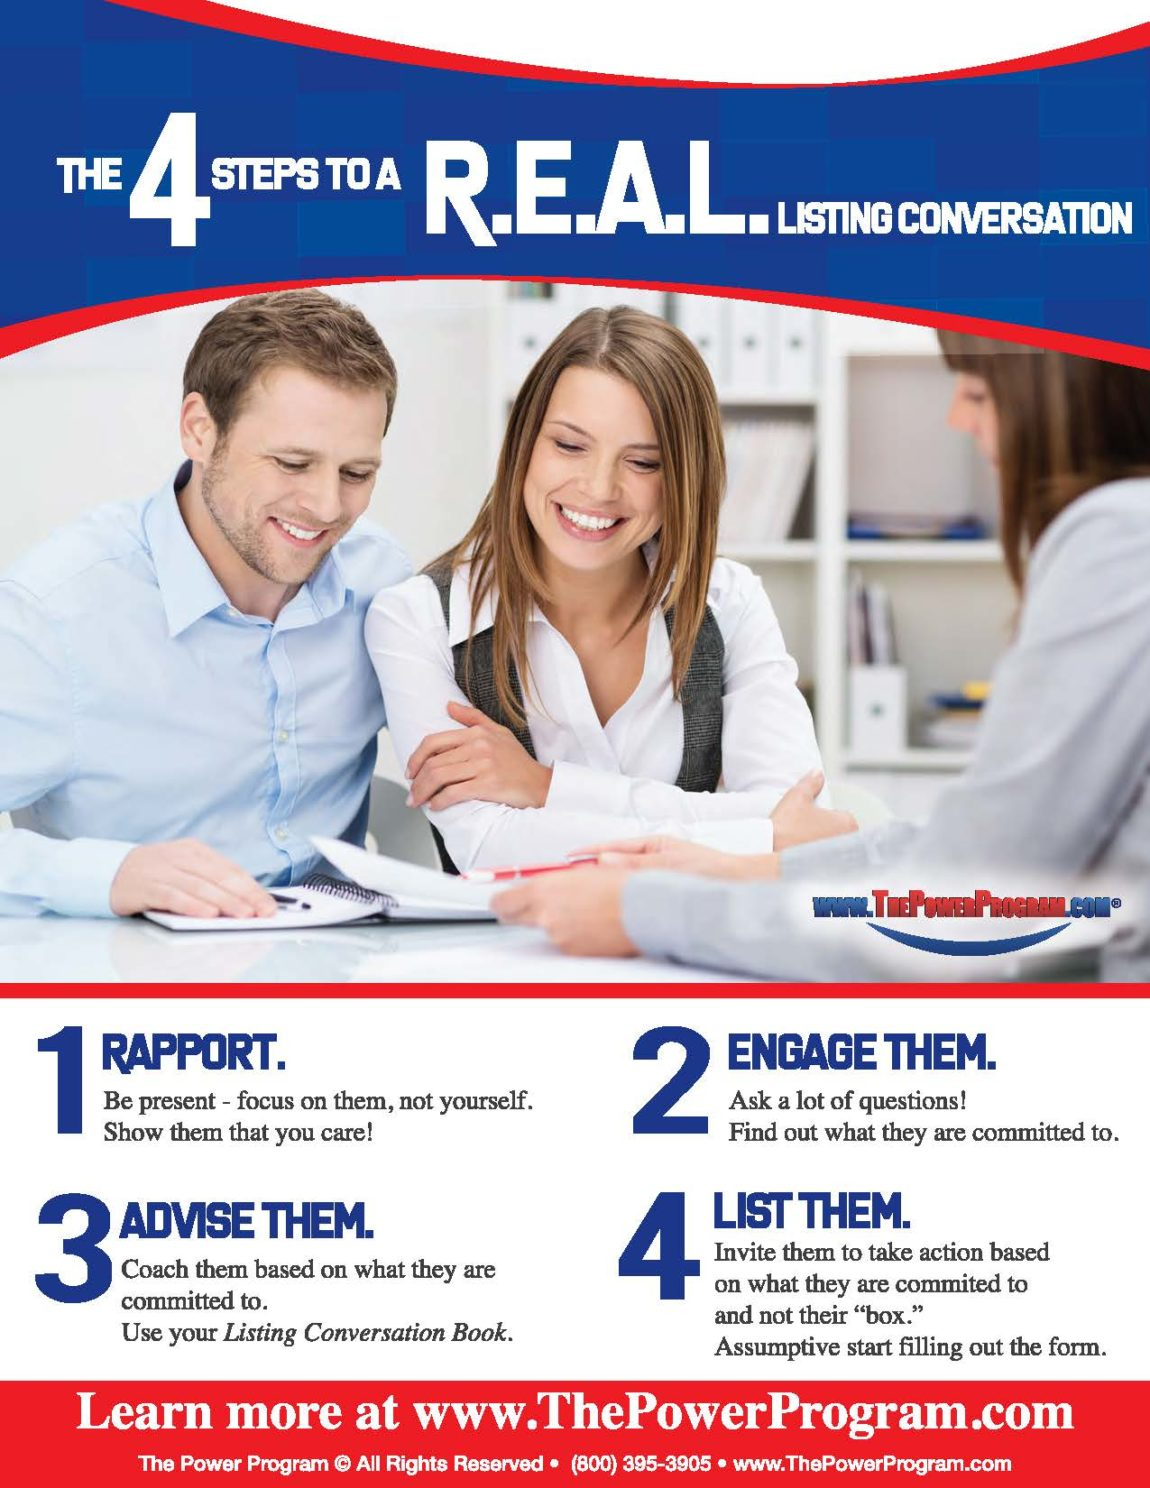 REAL-Listing-Conversation.jpg